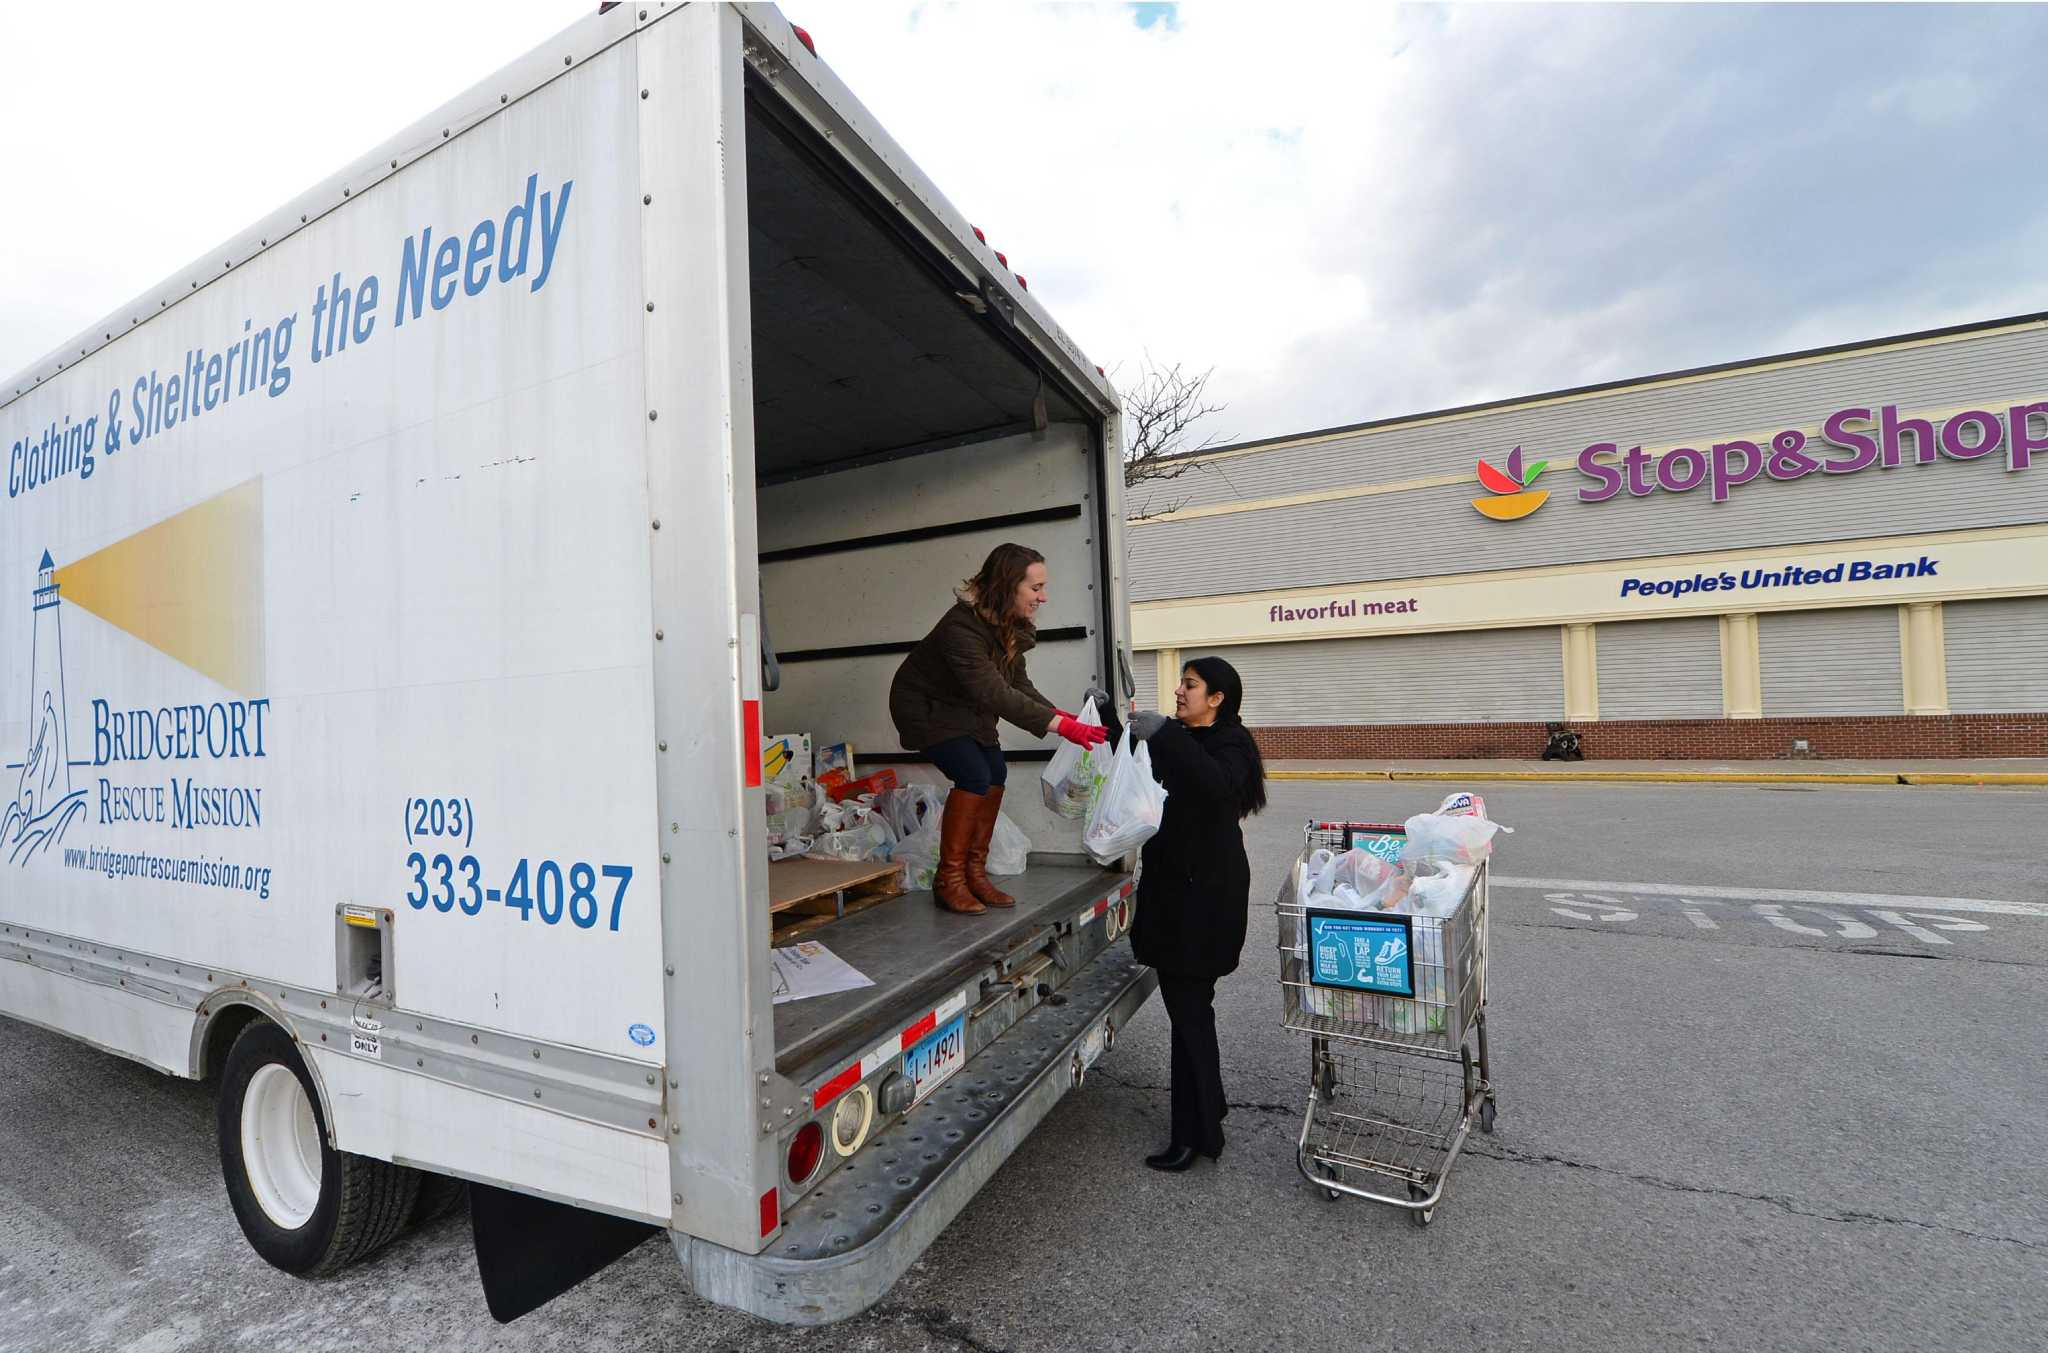 Diageo employees help to feed the needy fairfield citizen